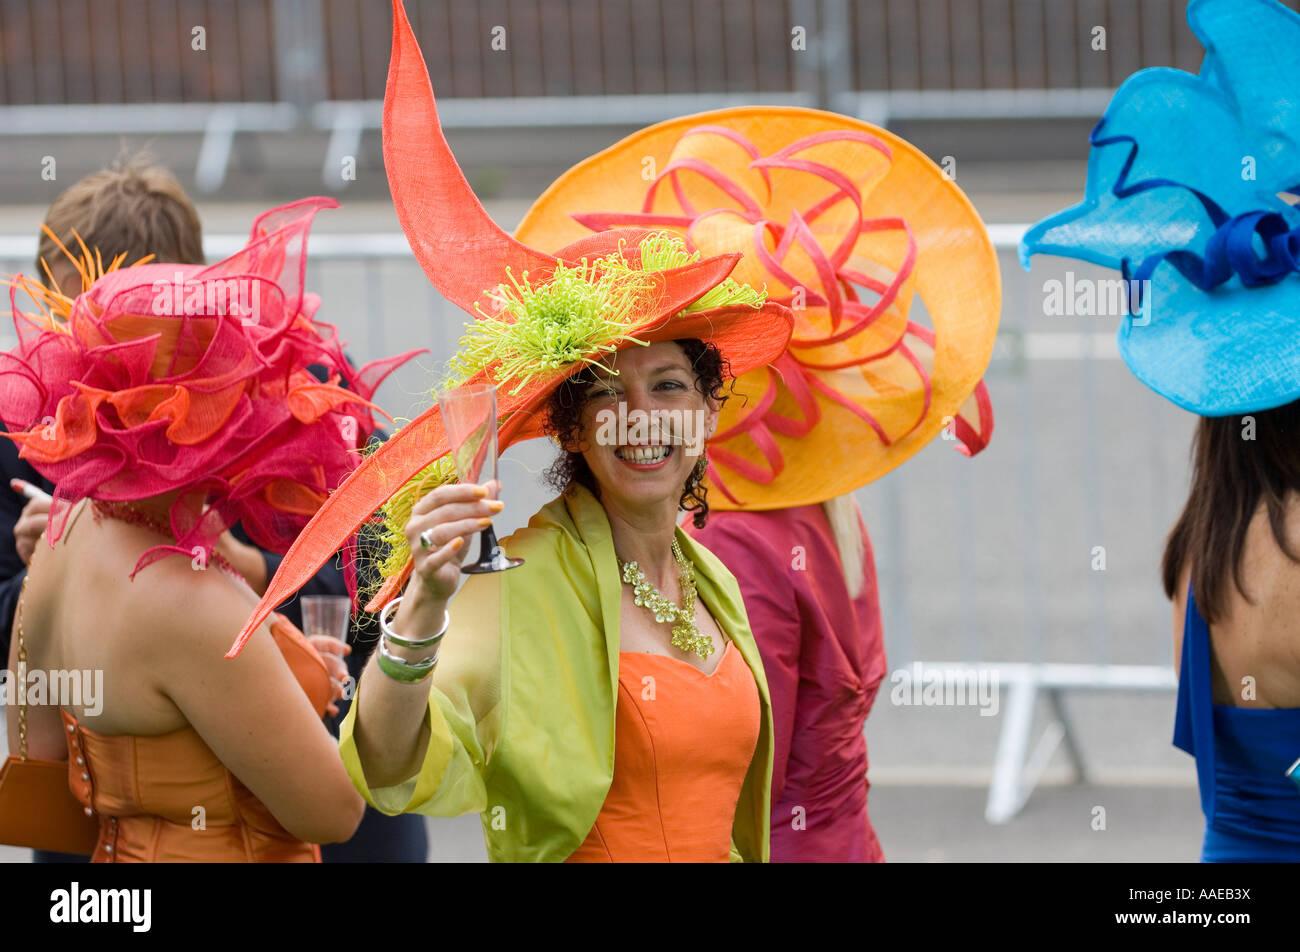 Women wearing extravagant hatsfashion on Ladies day at Royal Ascot 2007 - Stock Image